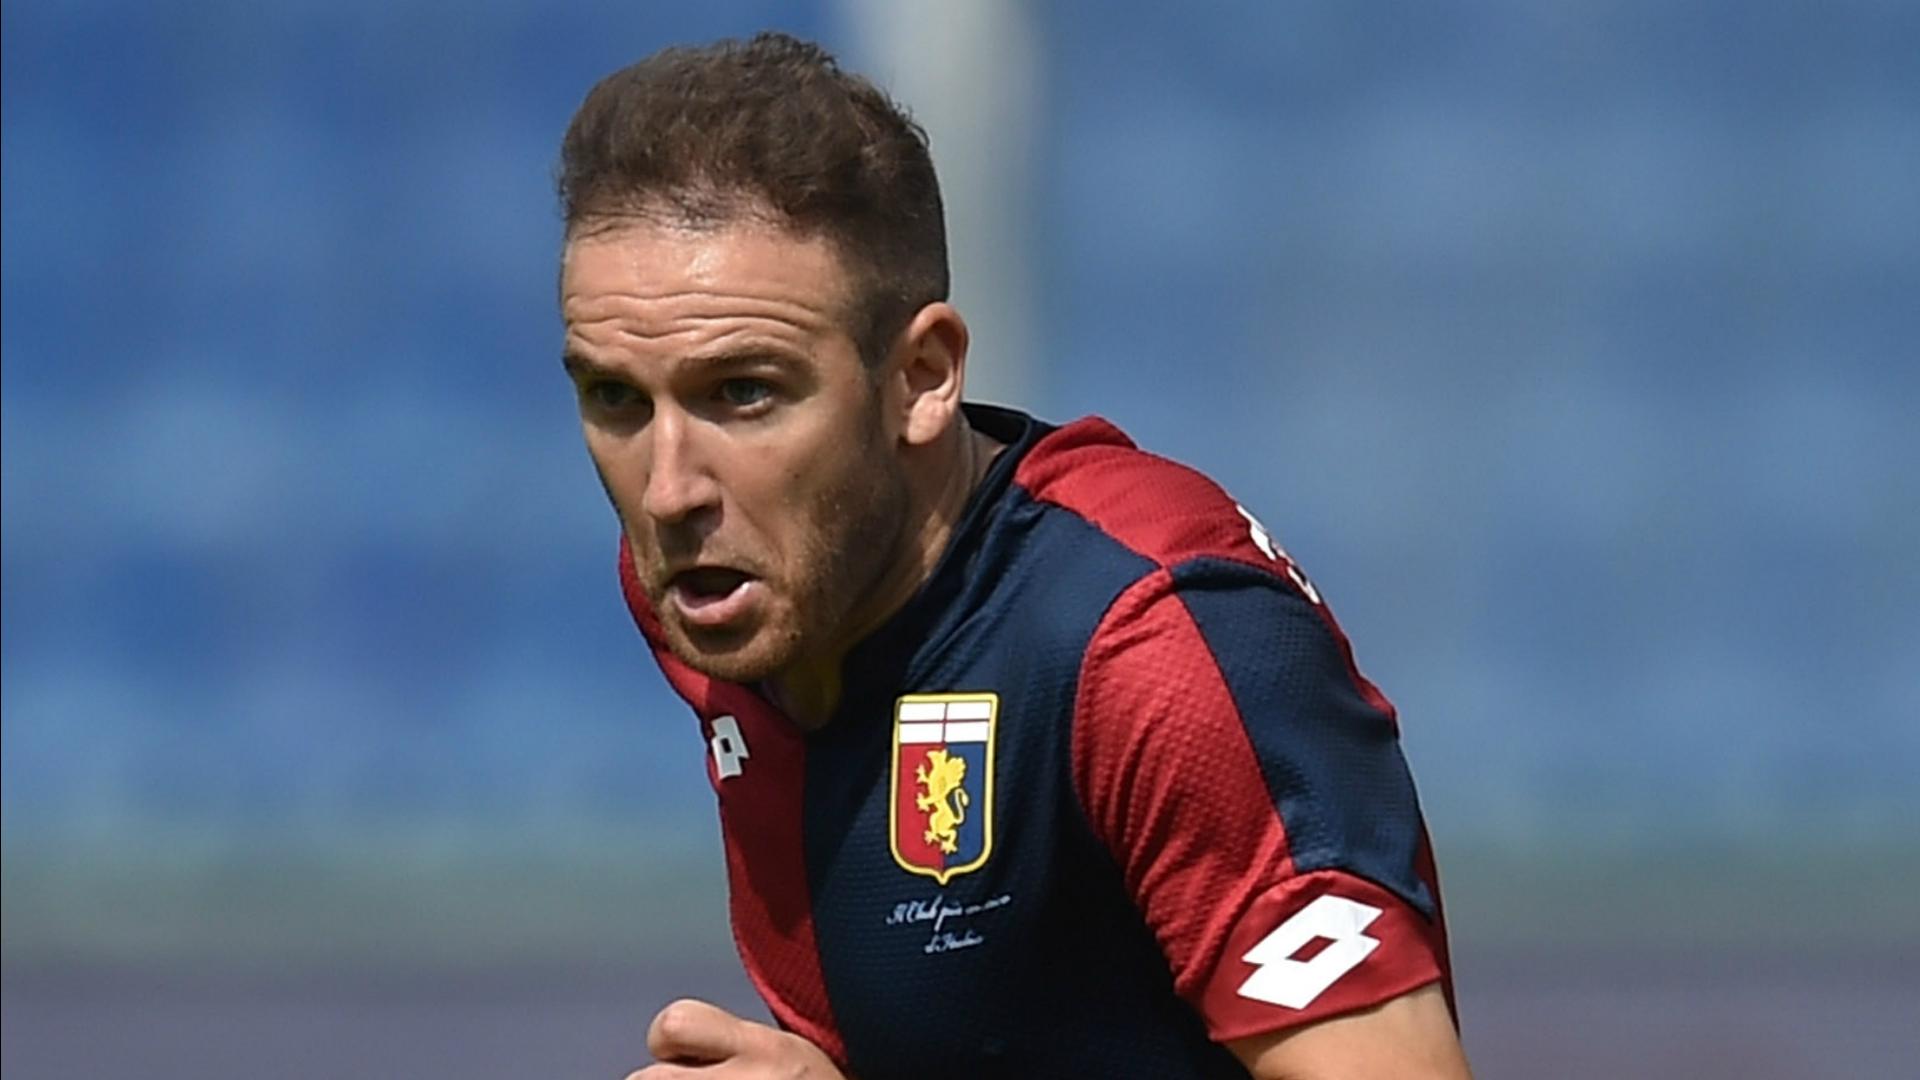 Diego Capel Genoa Serie A